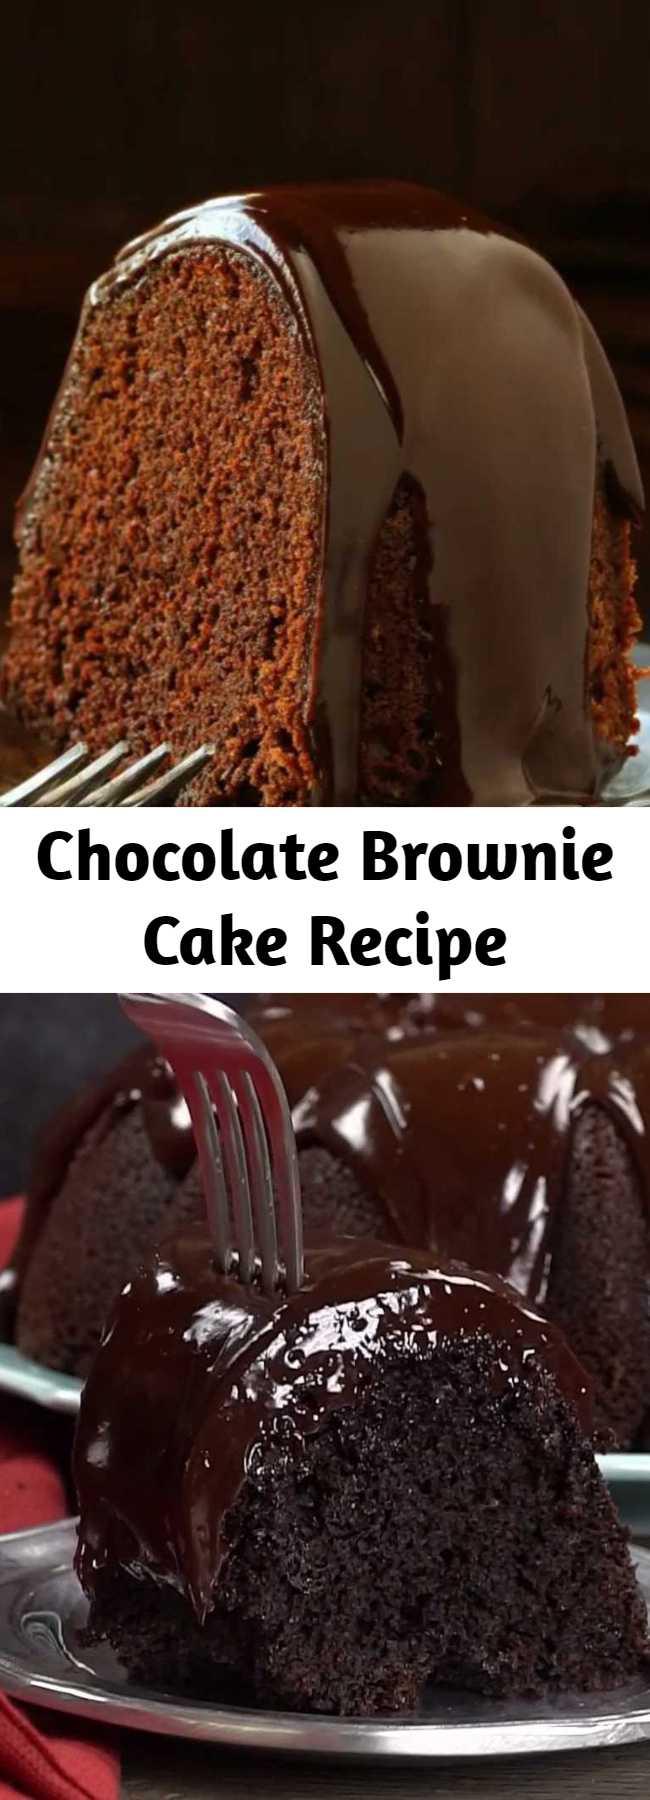 Chocolate Brownie Cake Recipe - Beyond easy but definitely impressive!